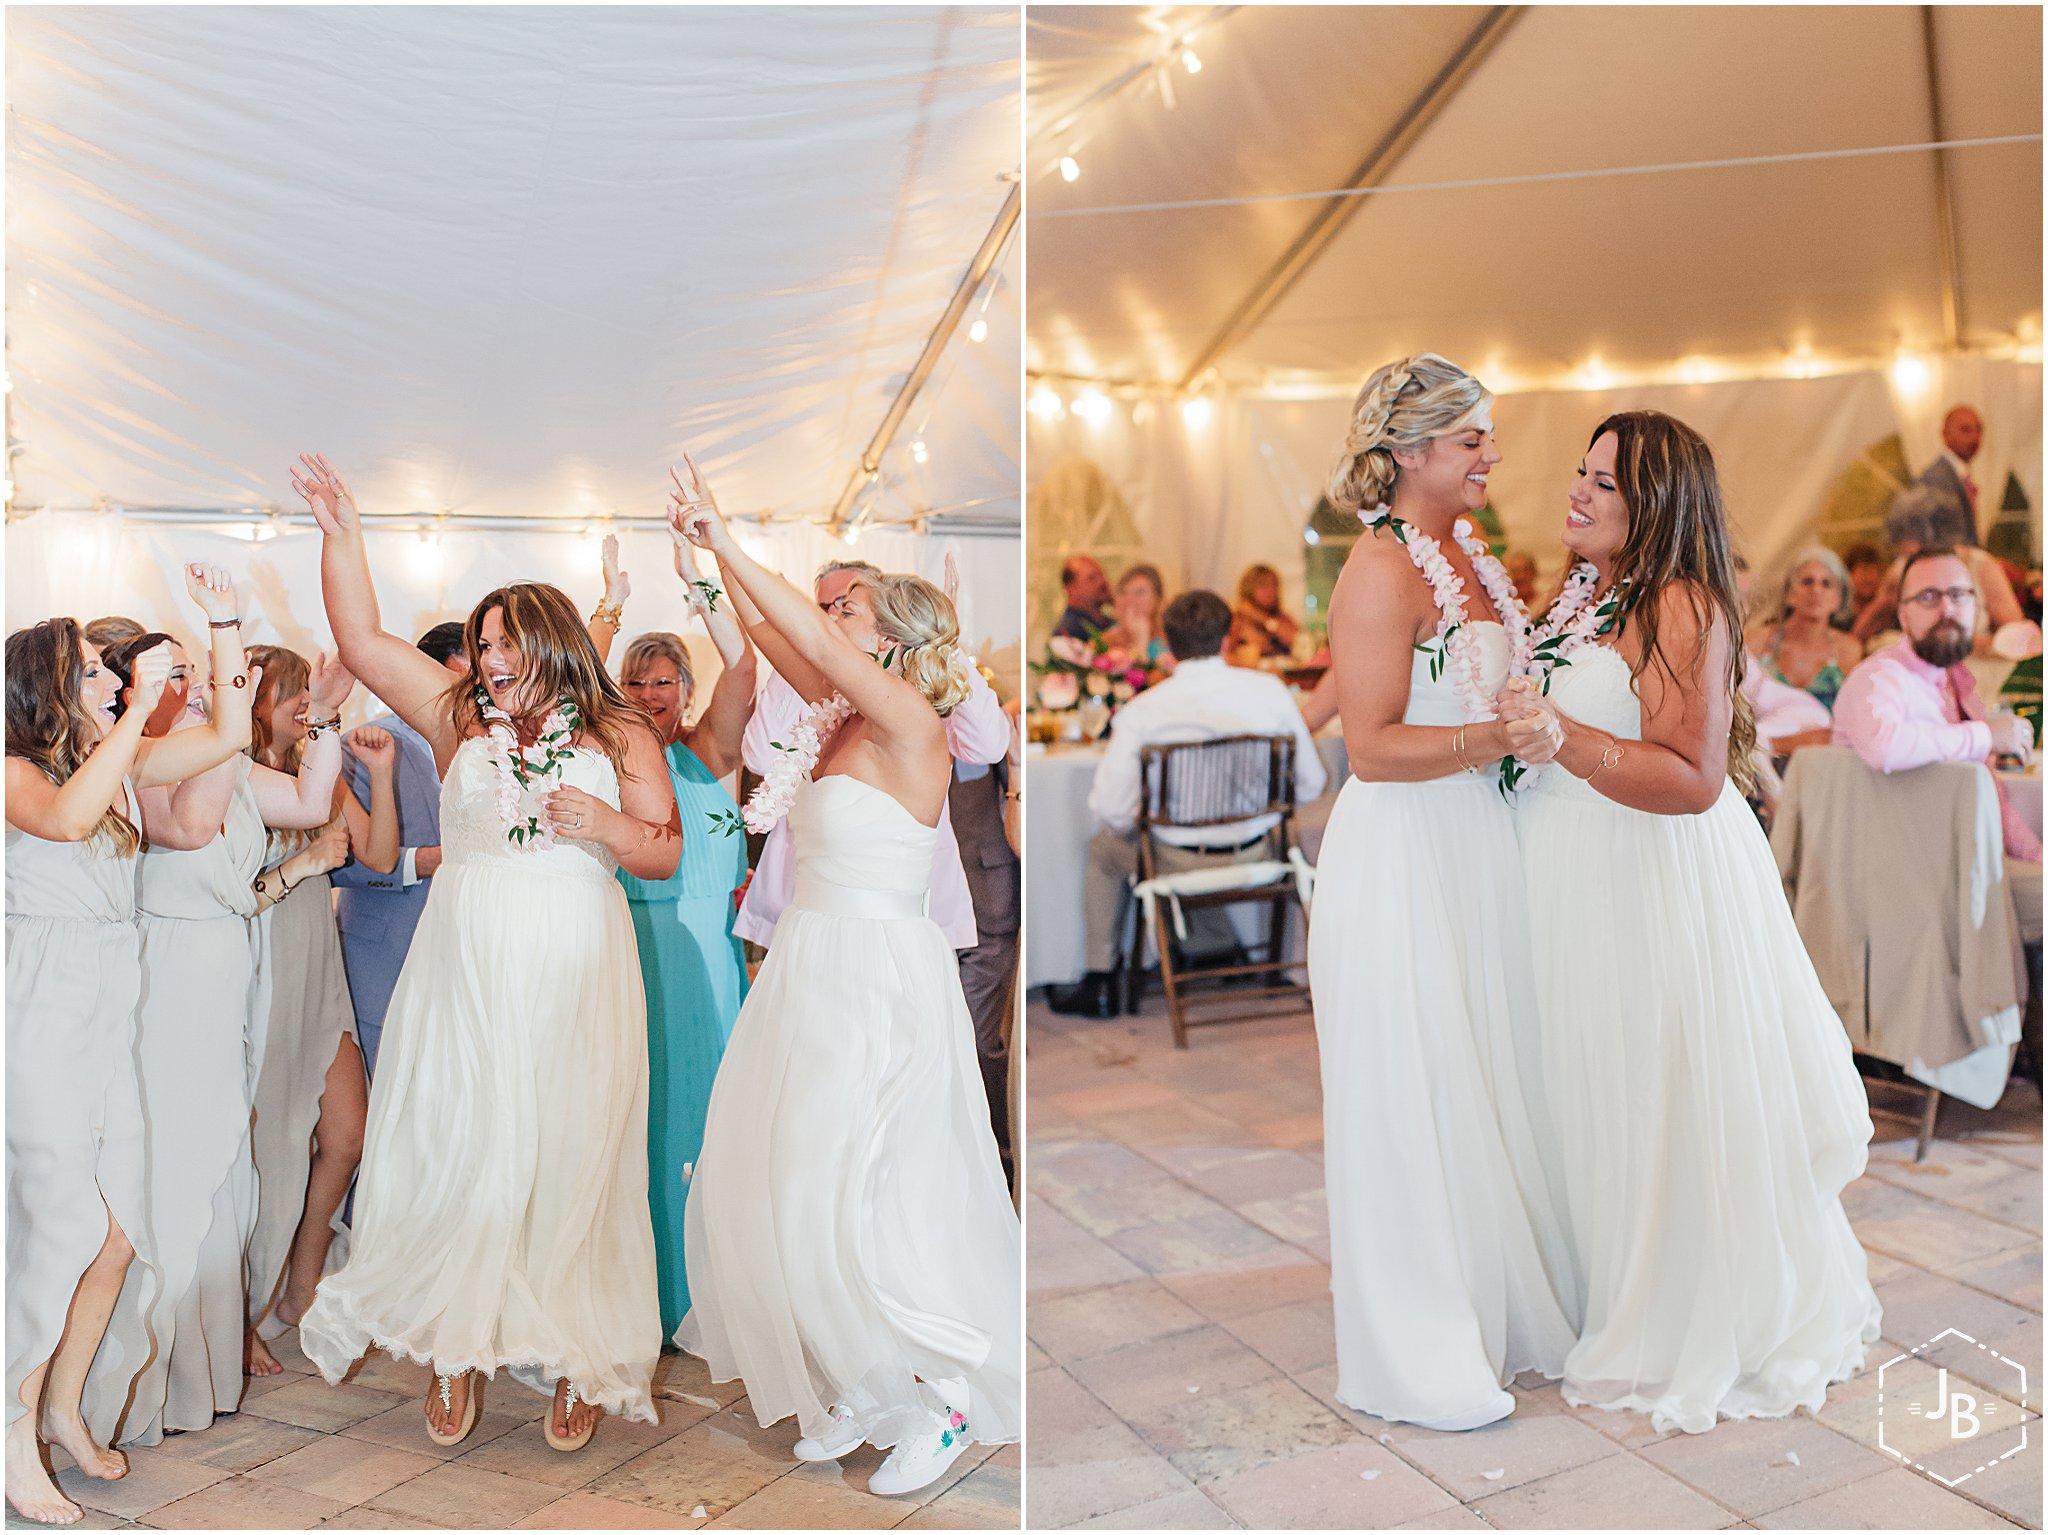 WeddingandEngagementFloridaPhotographer_1513.jpg